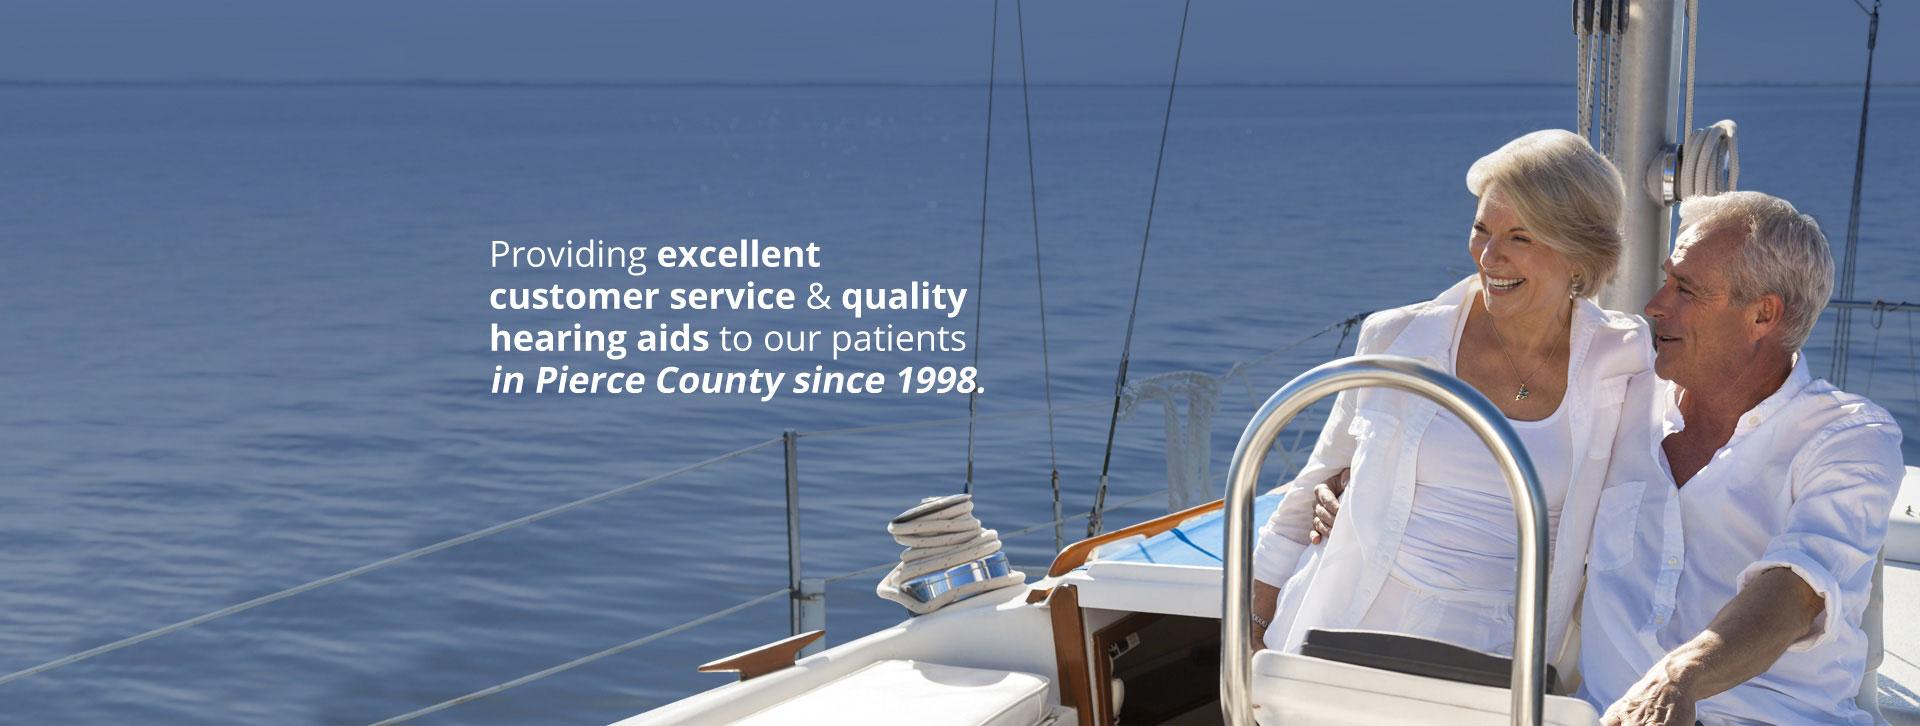 Harbor Audiology & Hearing Services, Inc., Tacoma ...